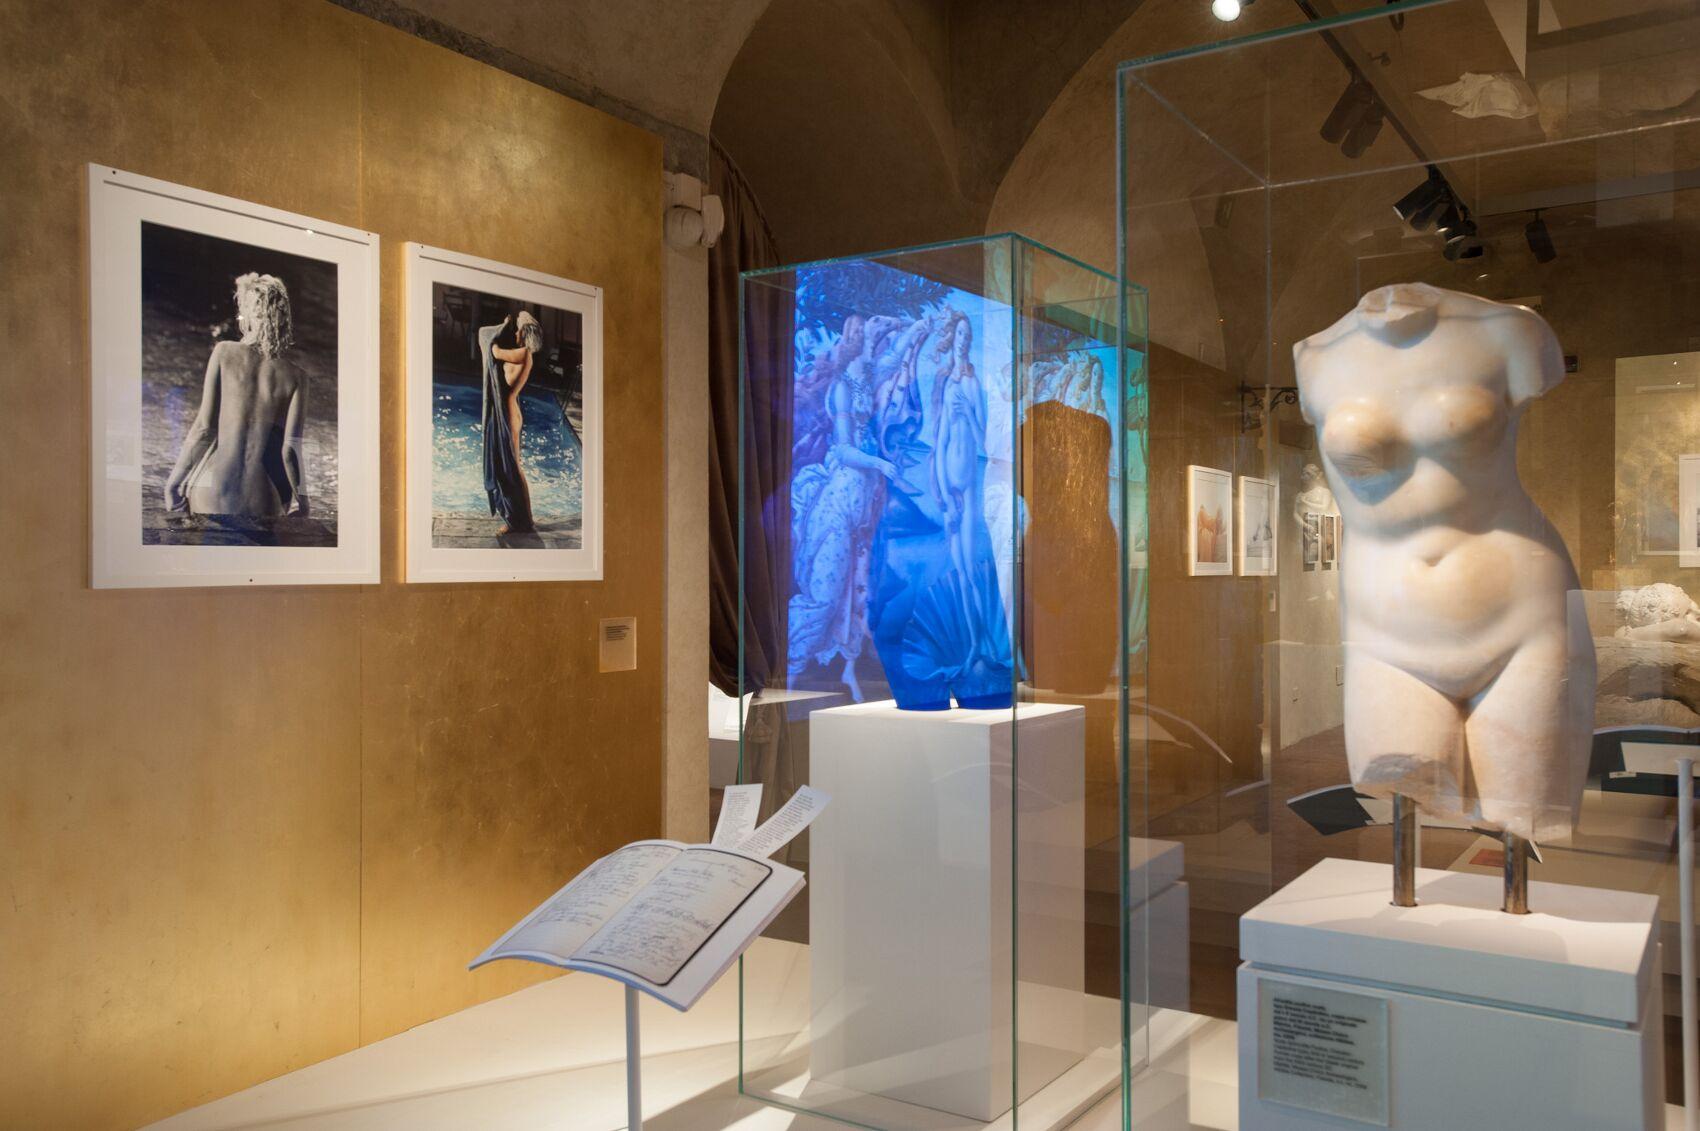 Salvatore Ferragamo Exhibition dedicated to Marilyn Monroe Salvatore Ferragamo Museum Statue